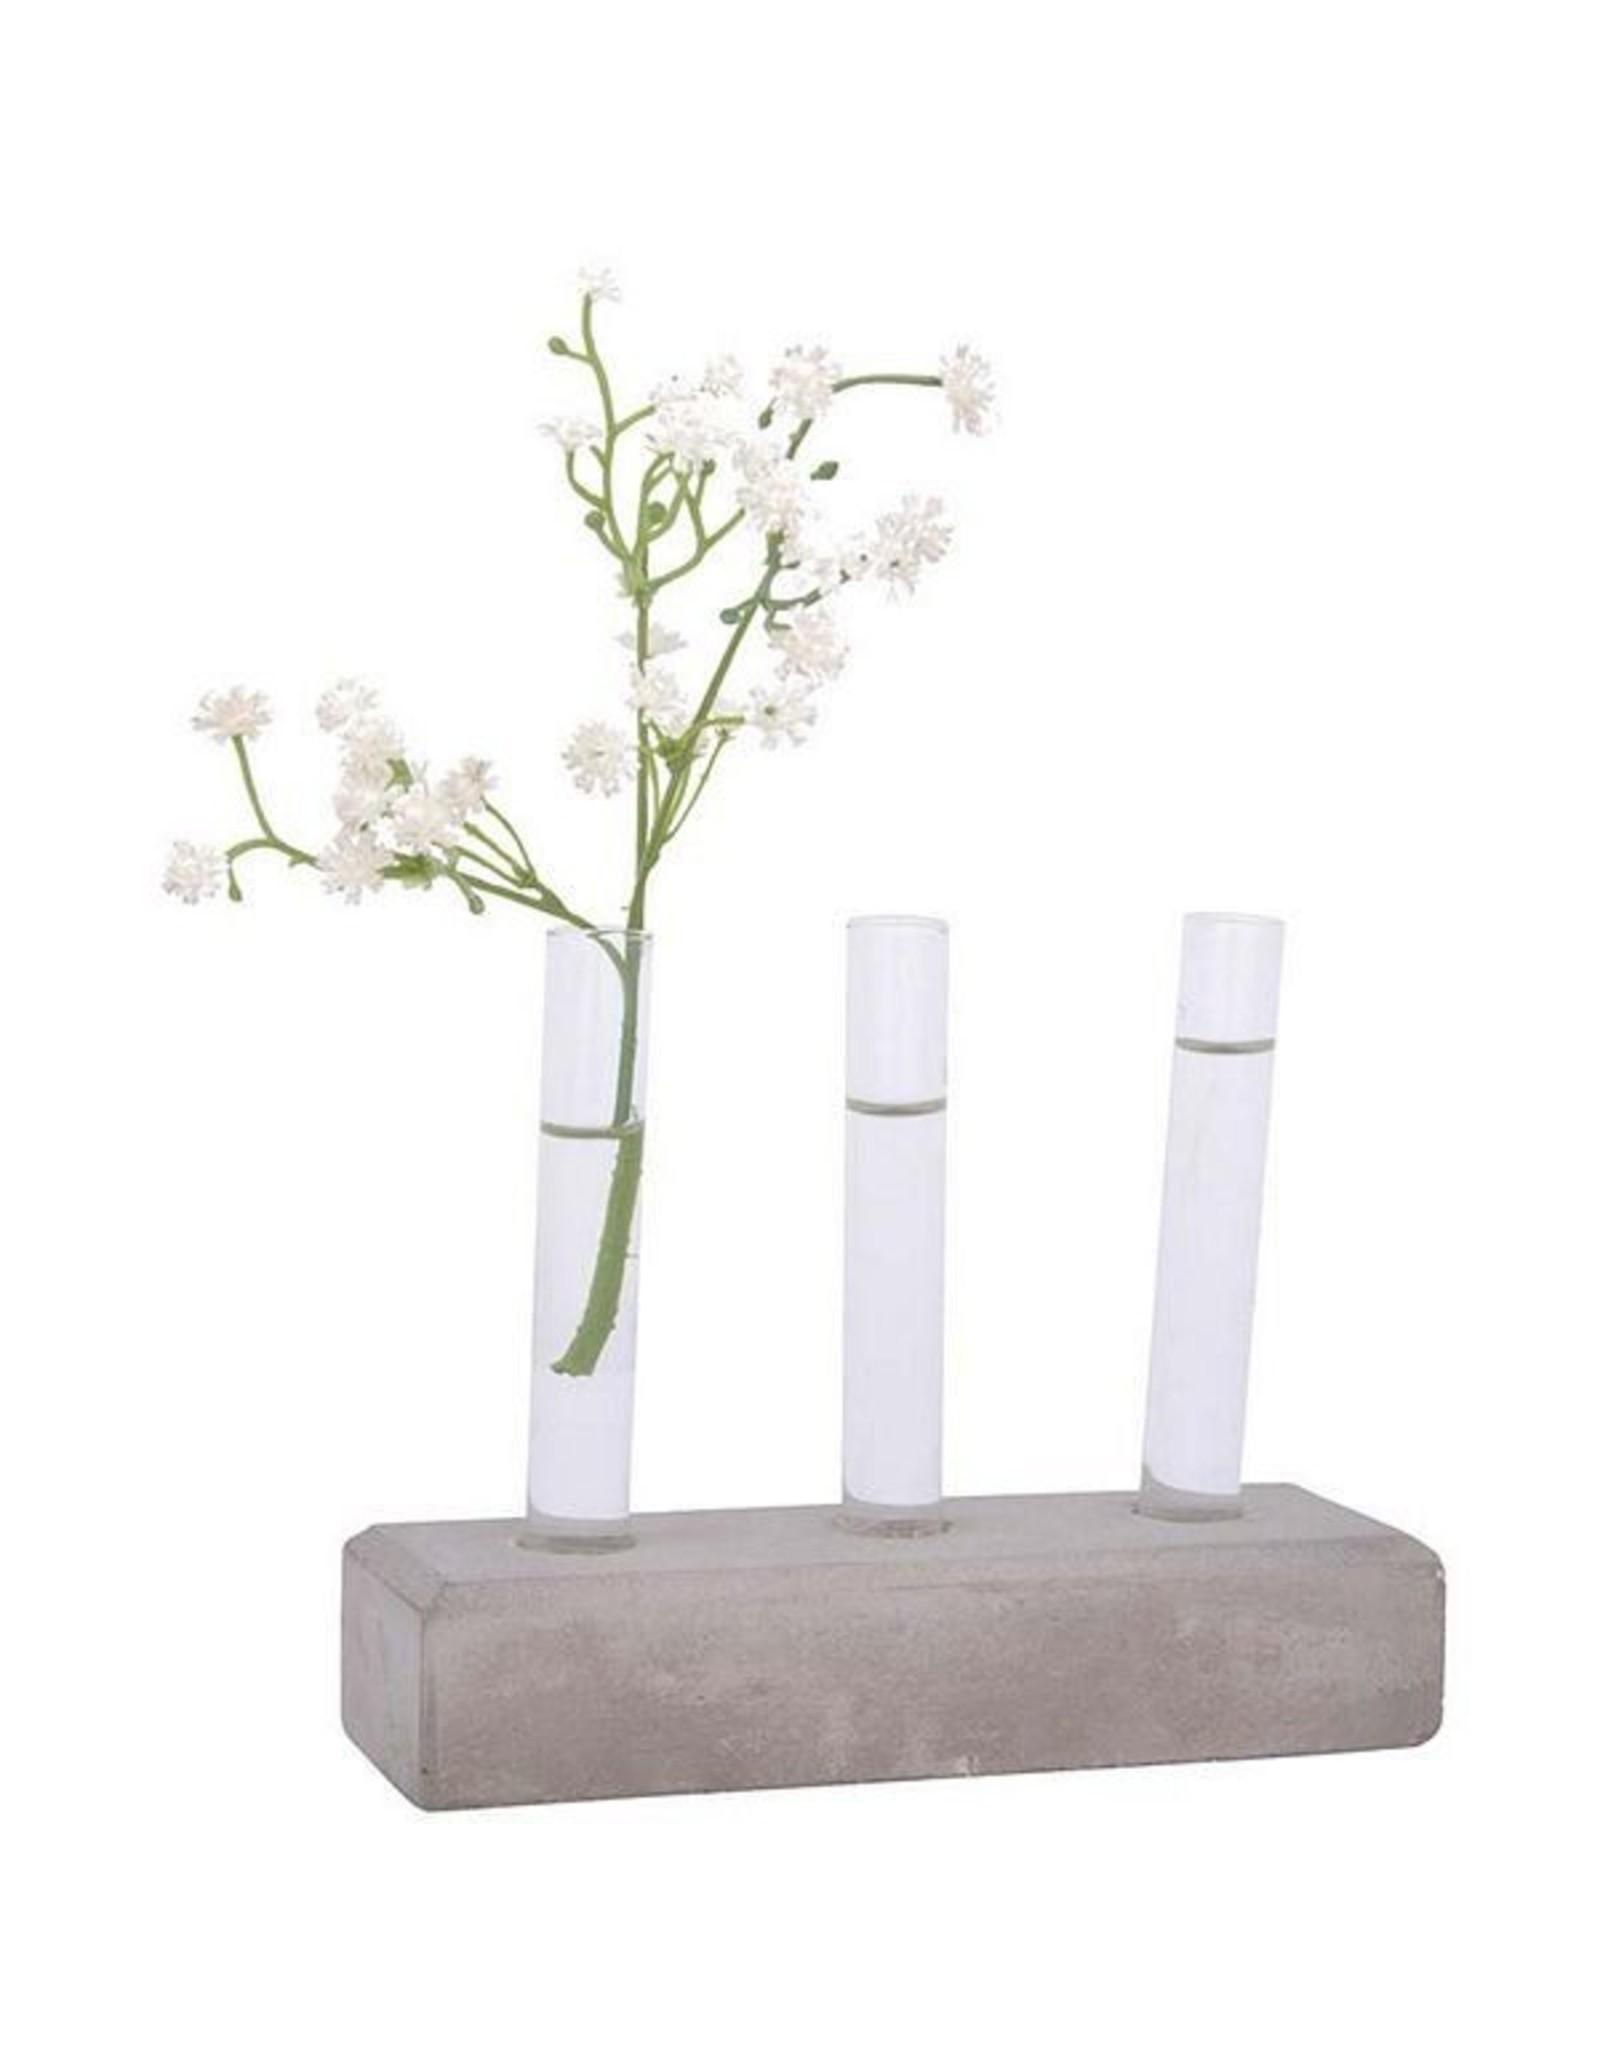 Esschert Cuttings Tubes Concrete Base - Set of 3